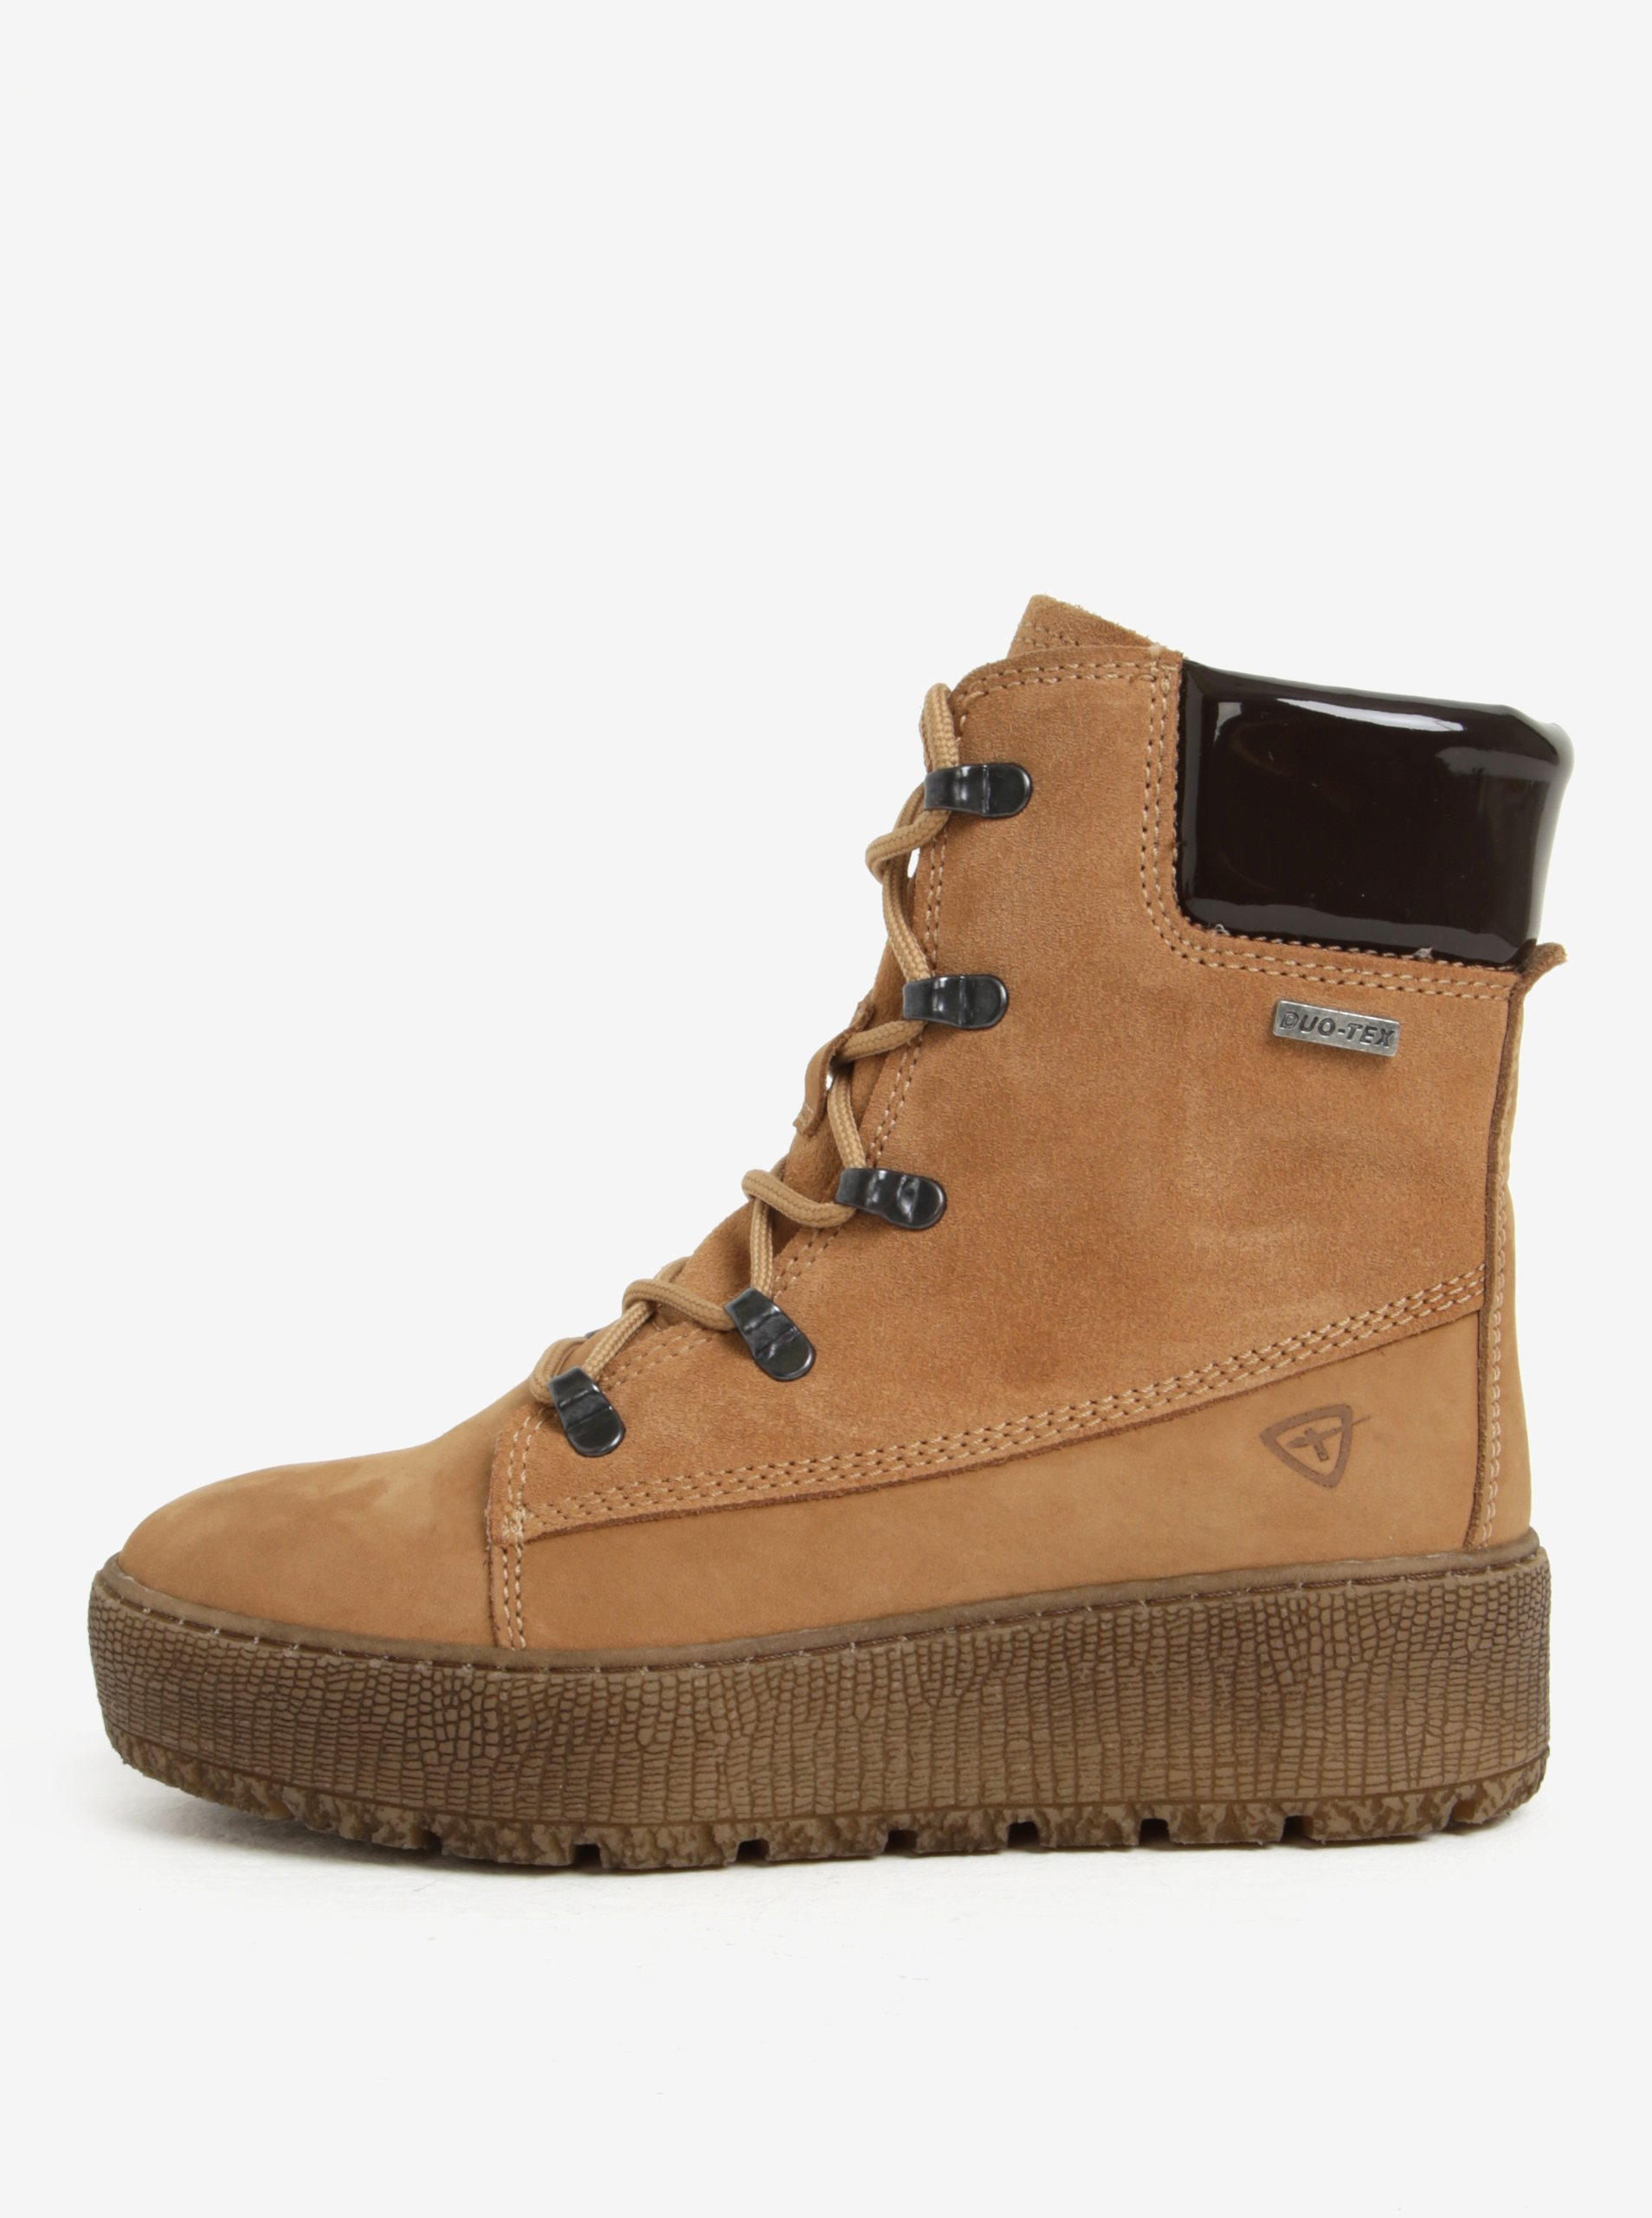 43dcc562527ff Hnedé členkové kožené topánky s vlnenou podšívkou Tamaris | Moda.sk